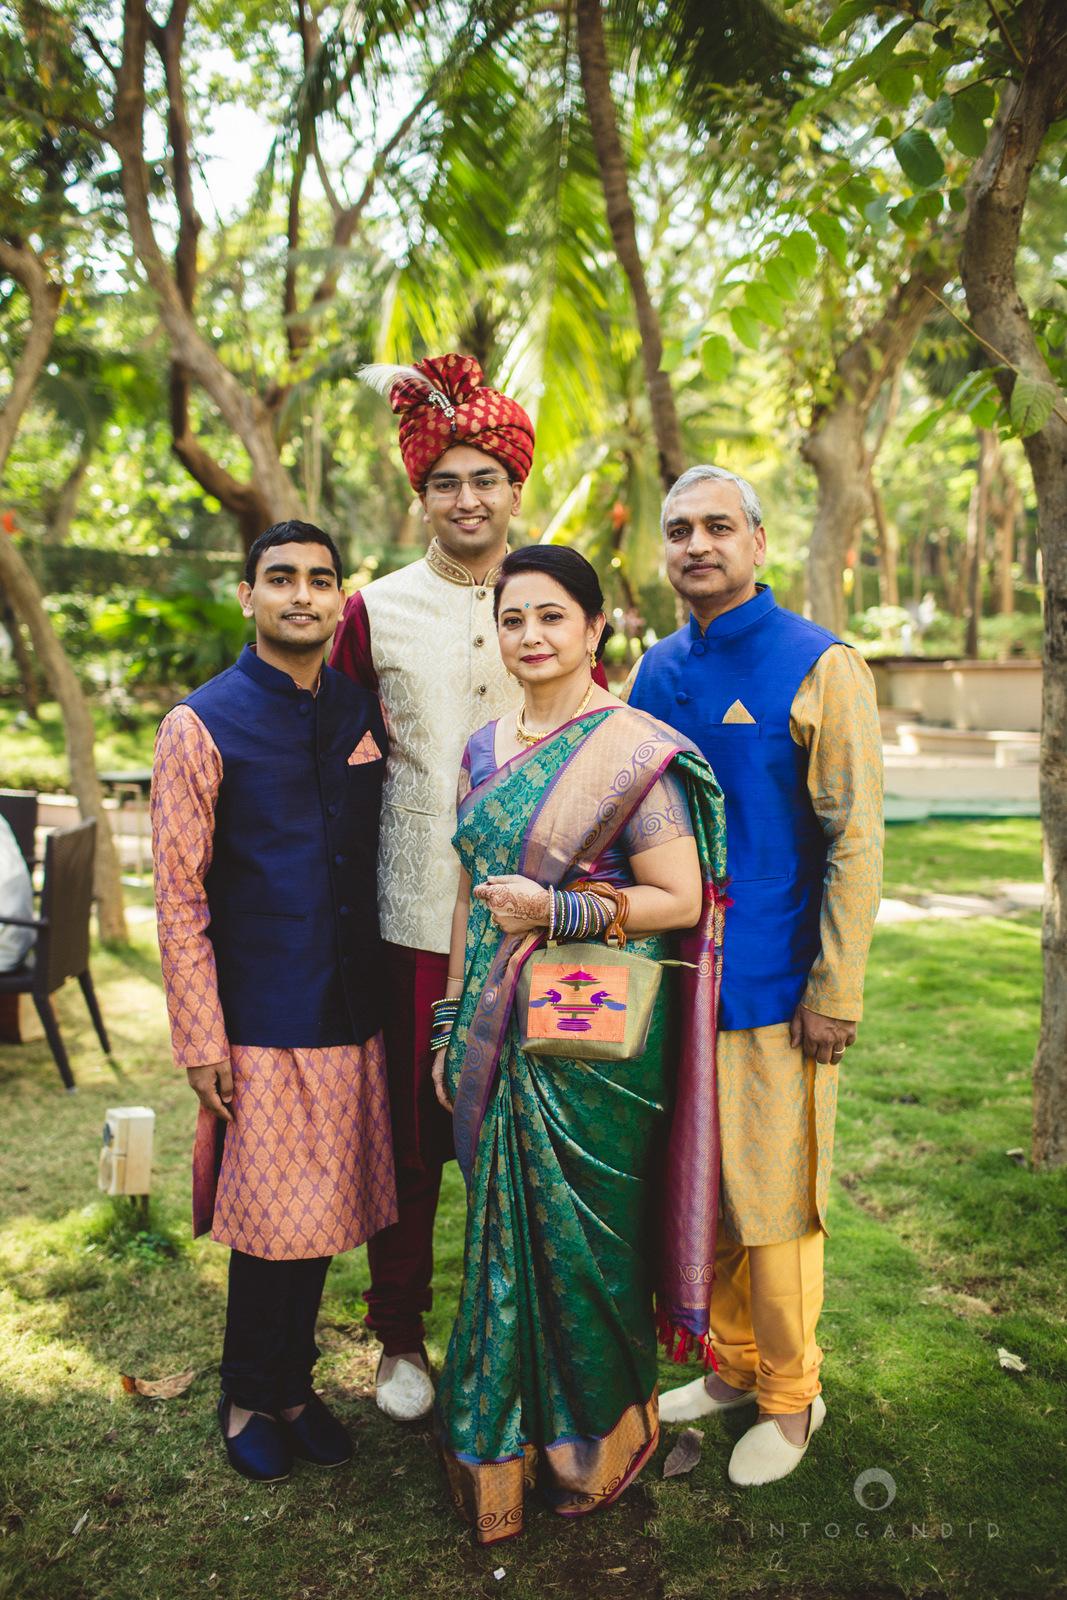 renaissance-powai-wedding-mumbai-intocandid-photography-17.jpg